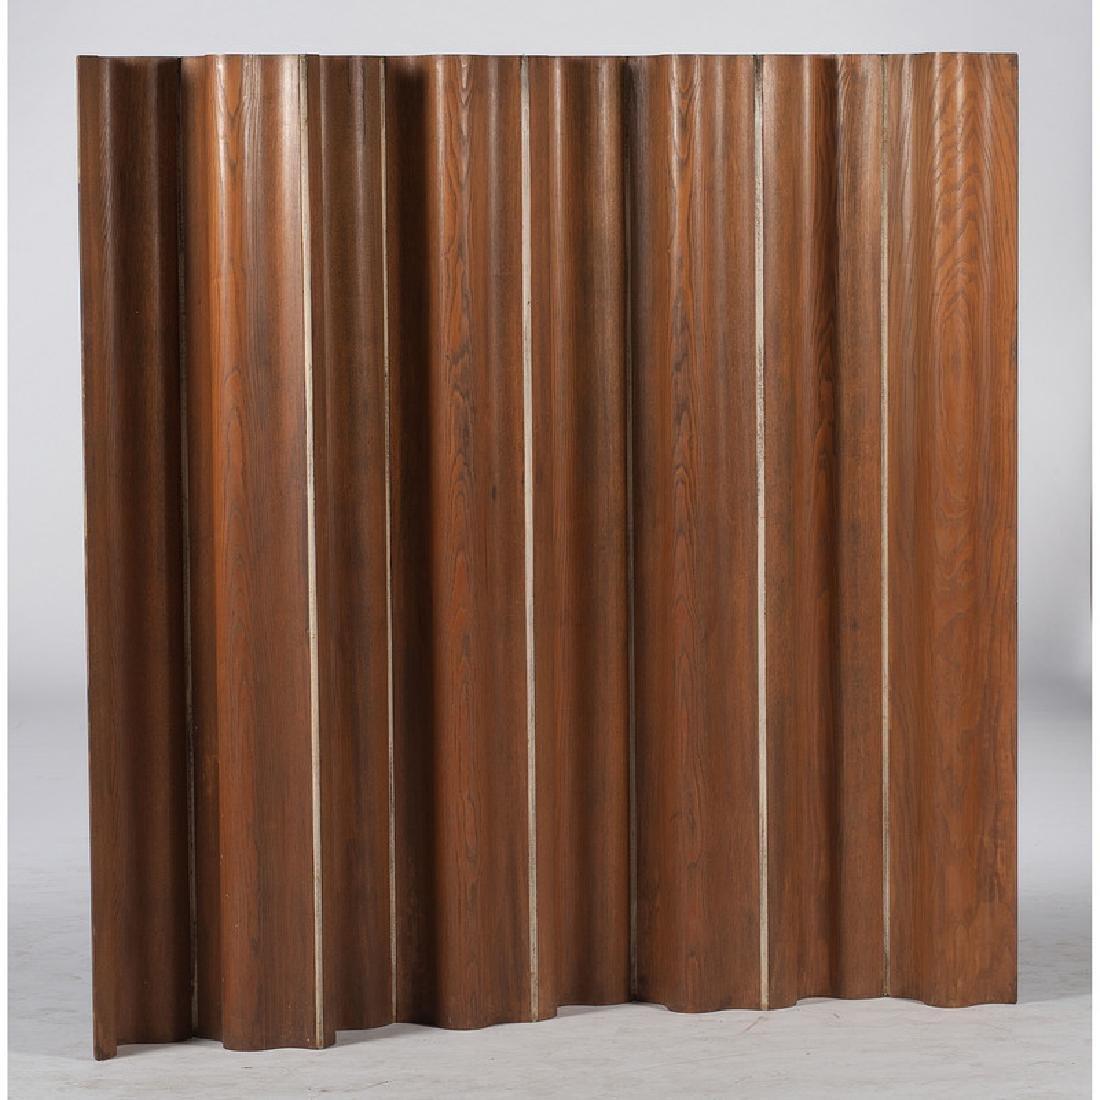 Eames Folding Screen - 2